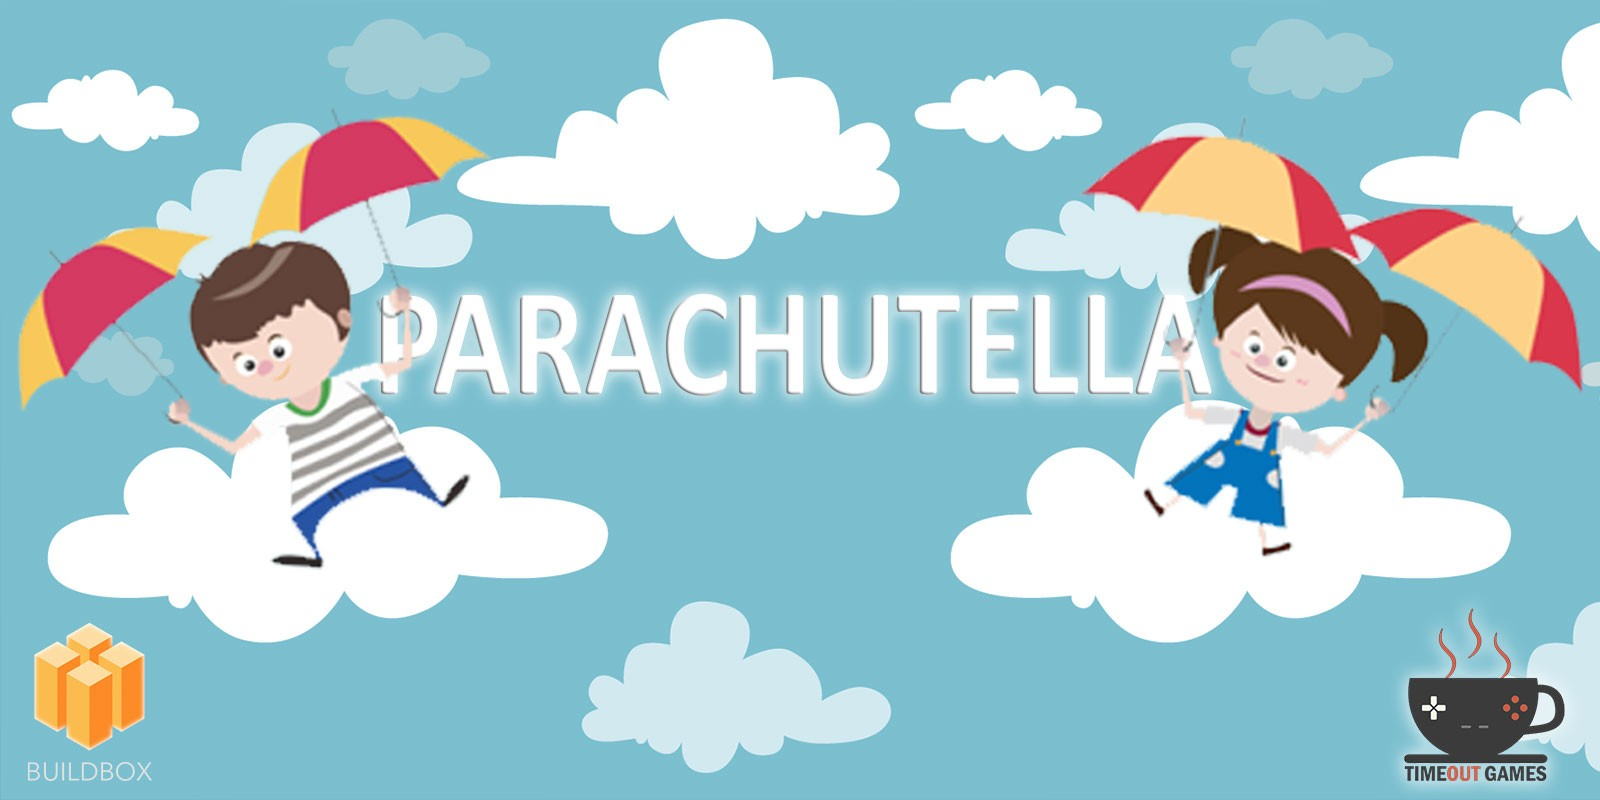 Parachutella - Full Buildbox Game